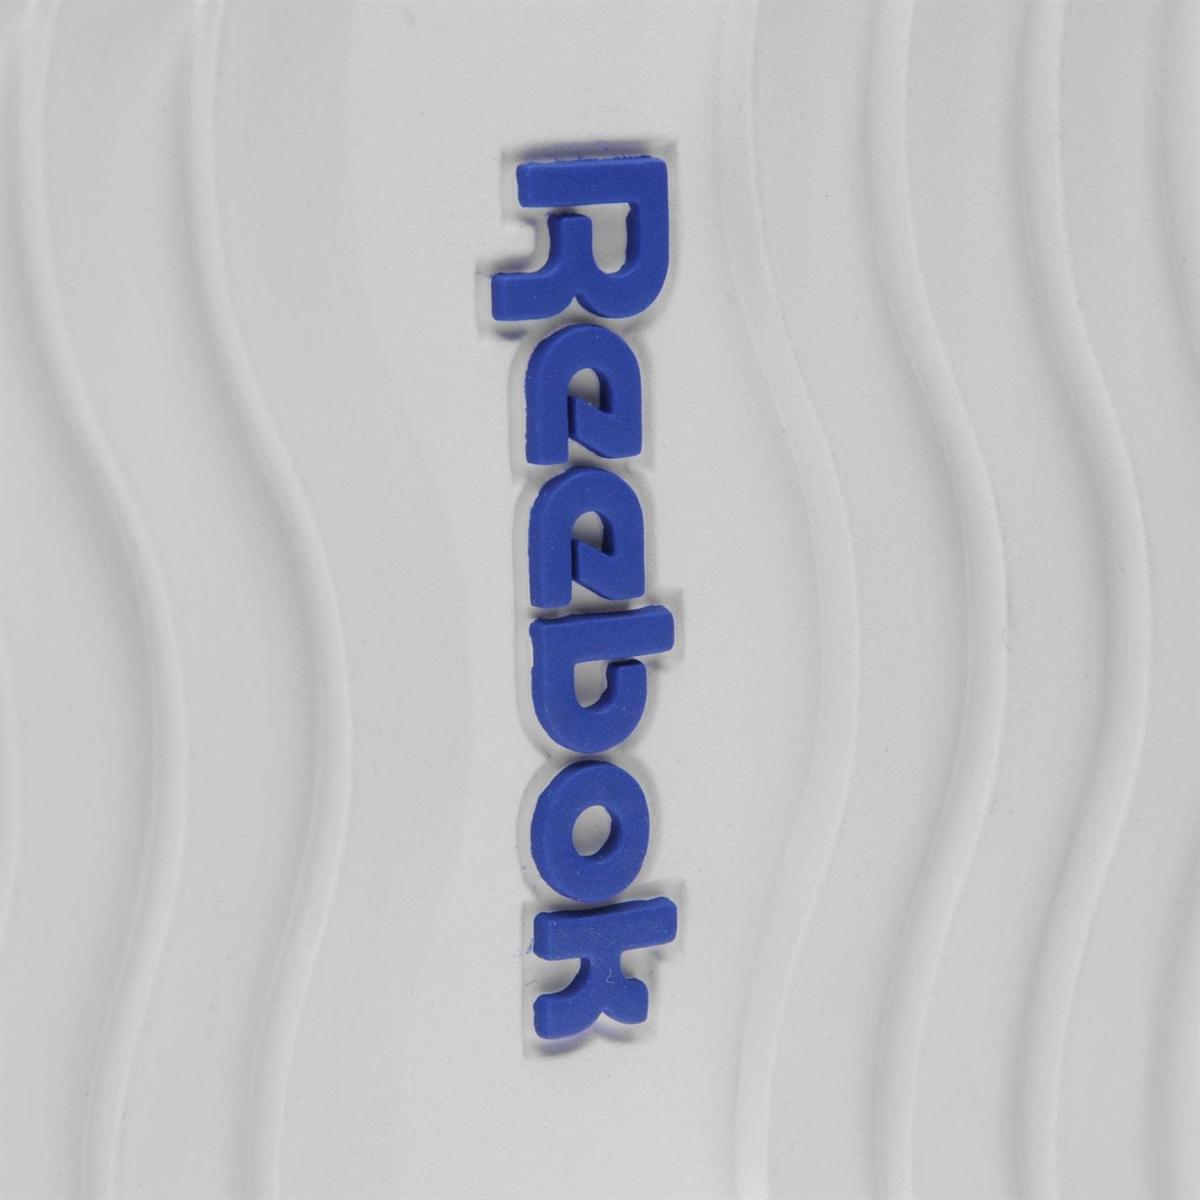 Reebok-Royal-Glide-Turnschuhe-Laufschuhe-Damen-Sneaker-Trainers-Sportschuhe-8001 Indexbild 14